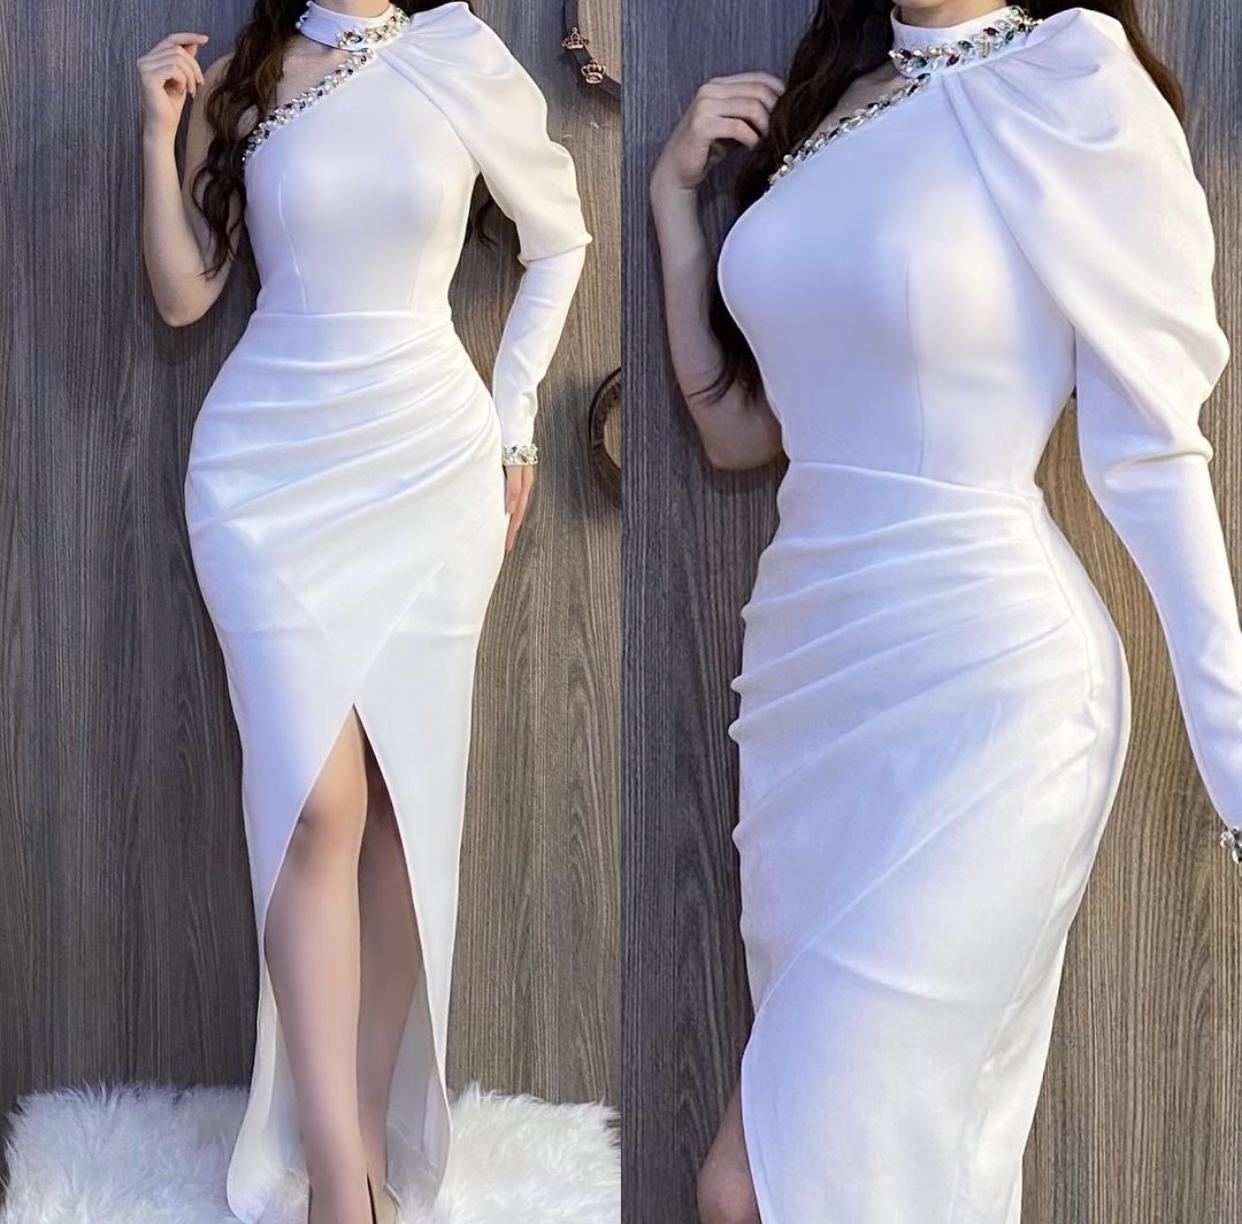 Elegant Dubai Arabic Middle Burgundy East Evening Dresses Party Gowns Prom Dress Long Sleeve Beads One Shoulder High Side Split Formal Gowns